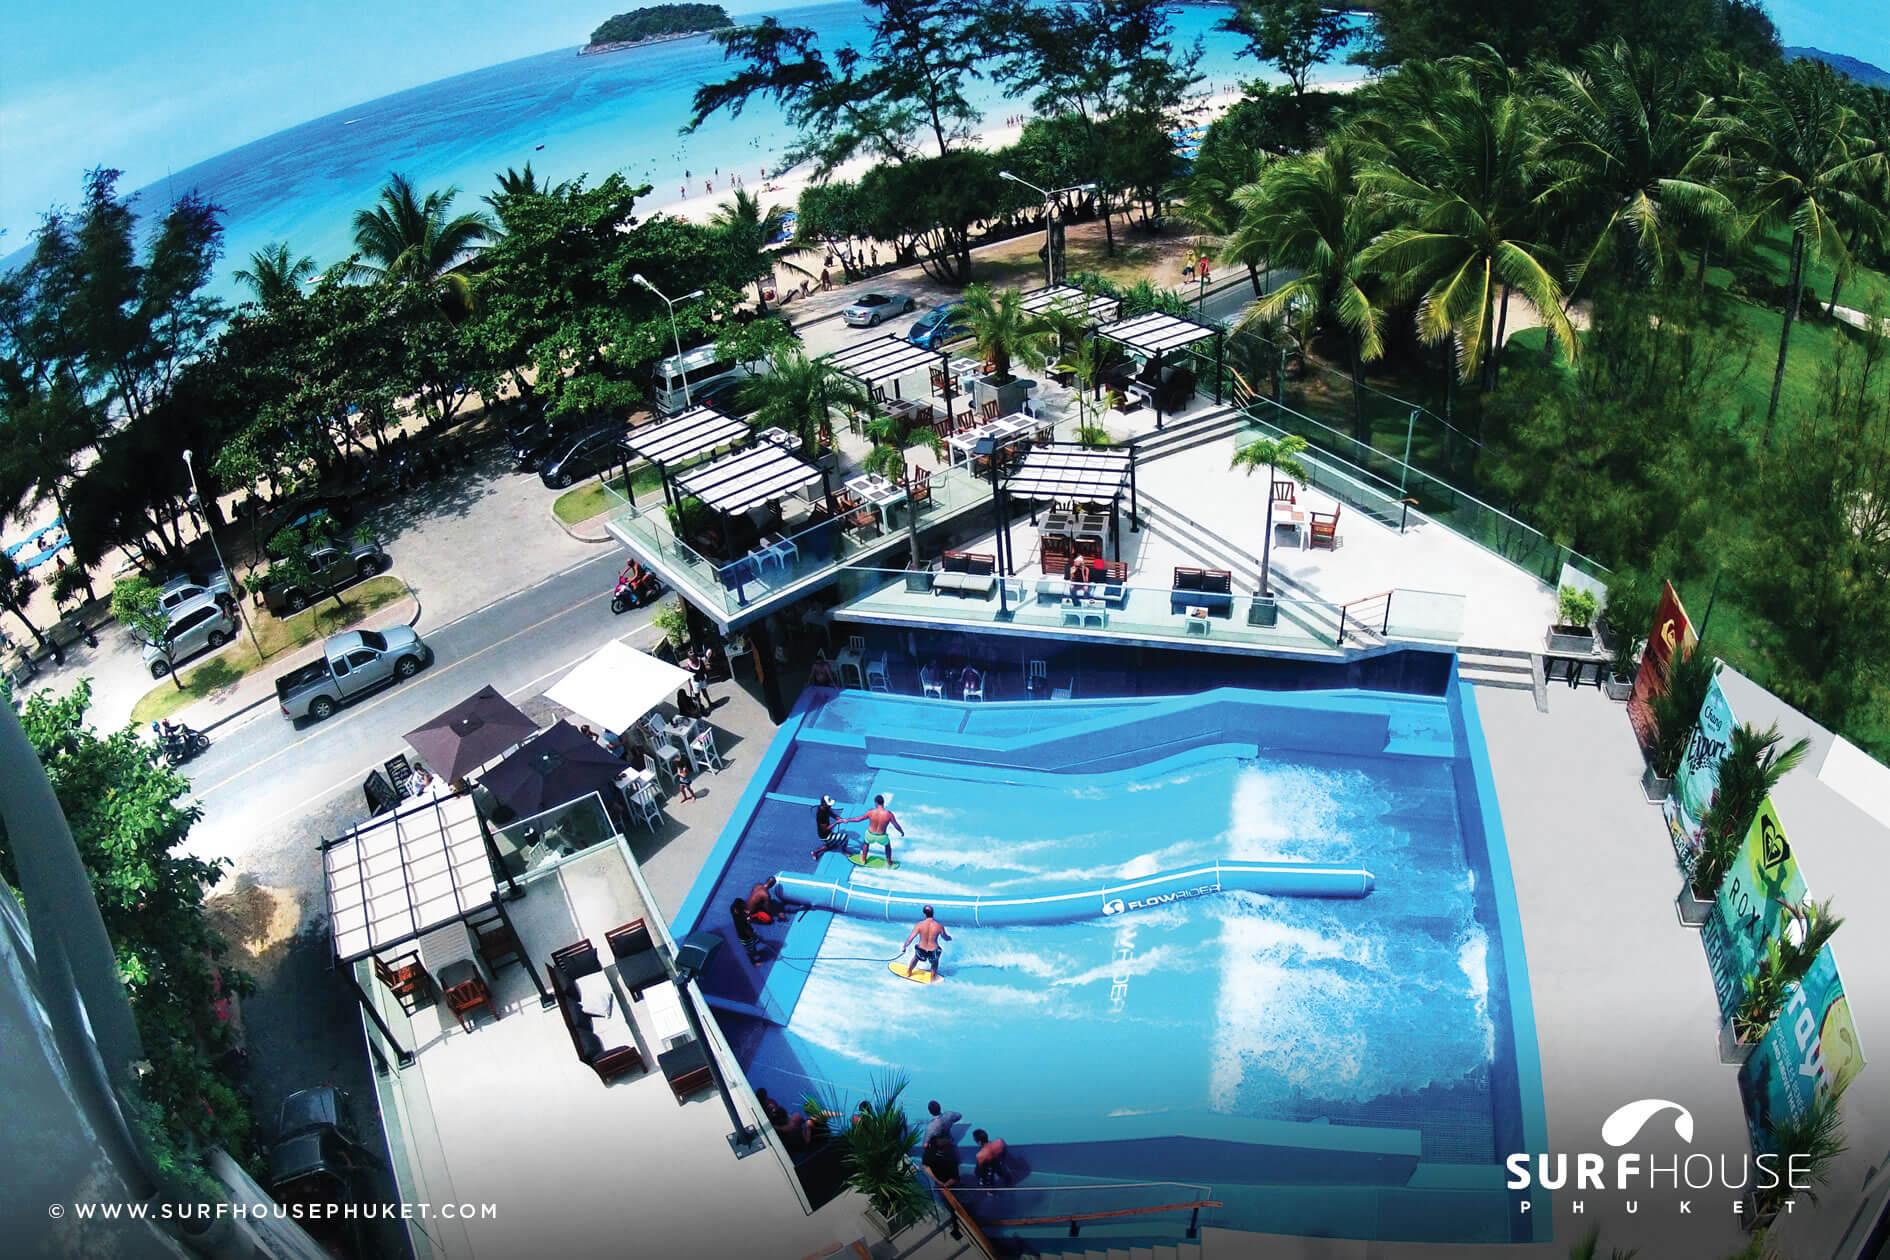 serf-haus-na-phukete-surf-house развлечения на пхукете